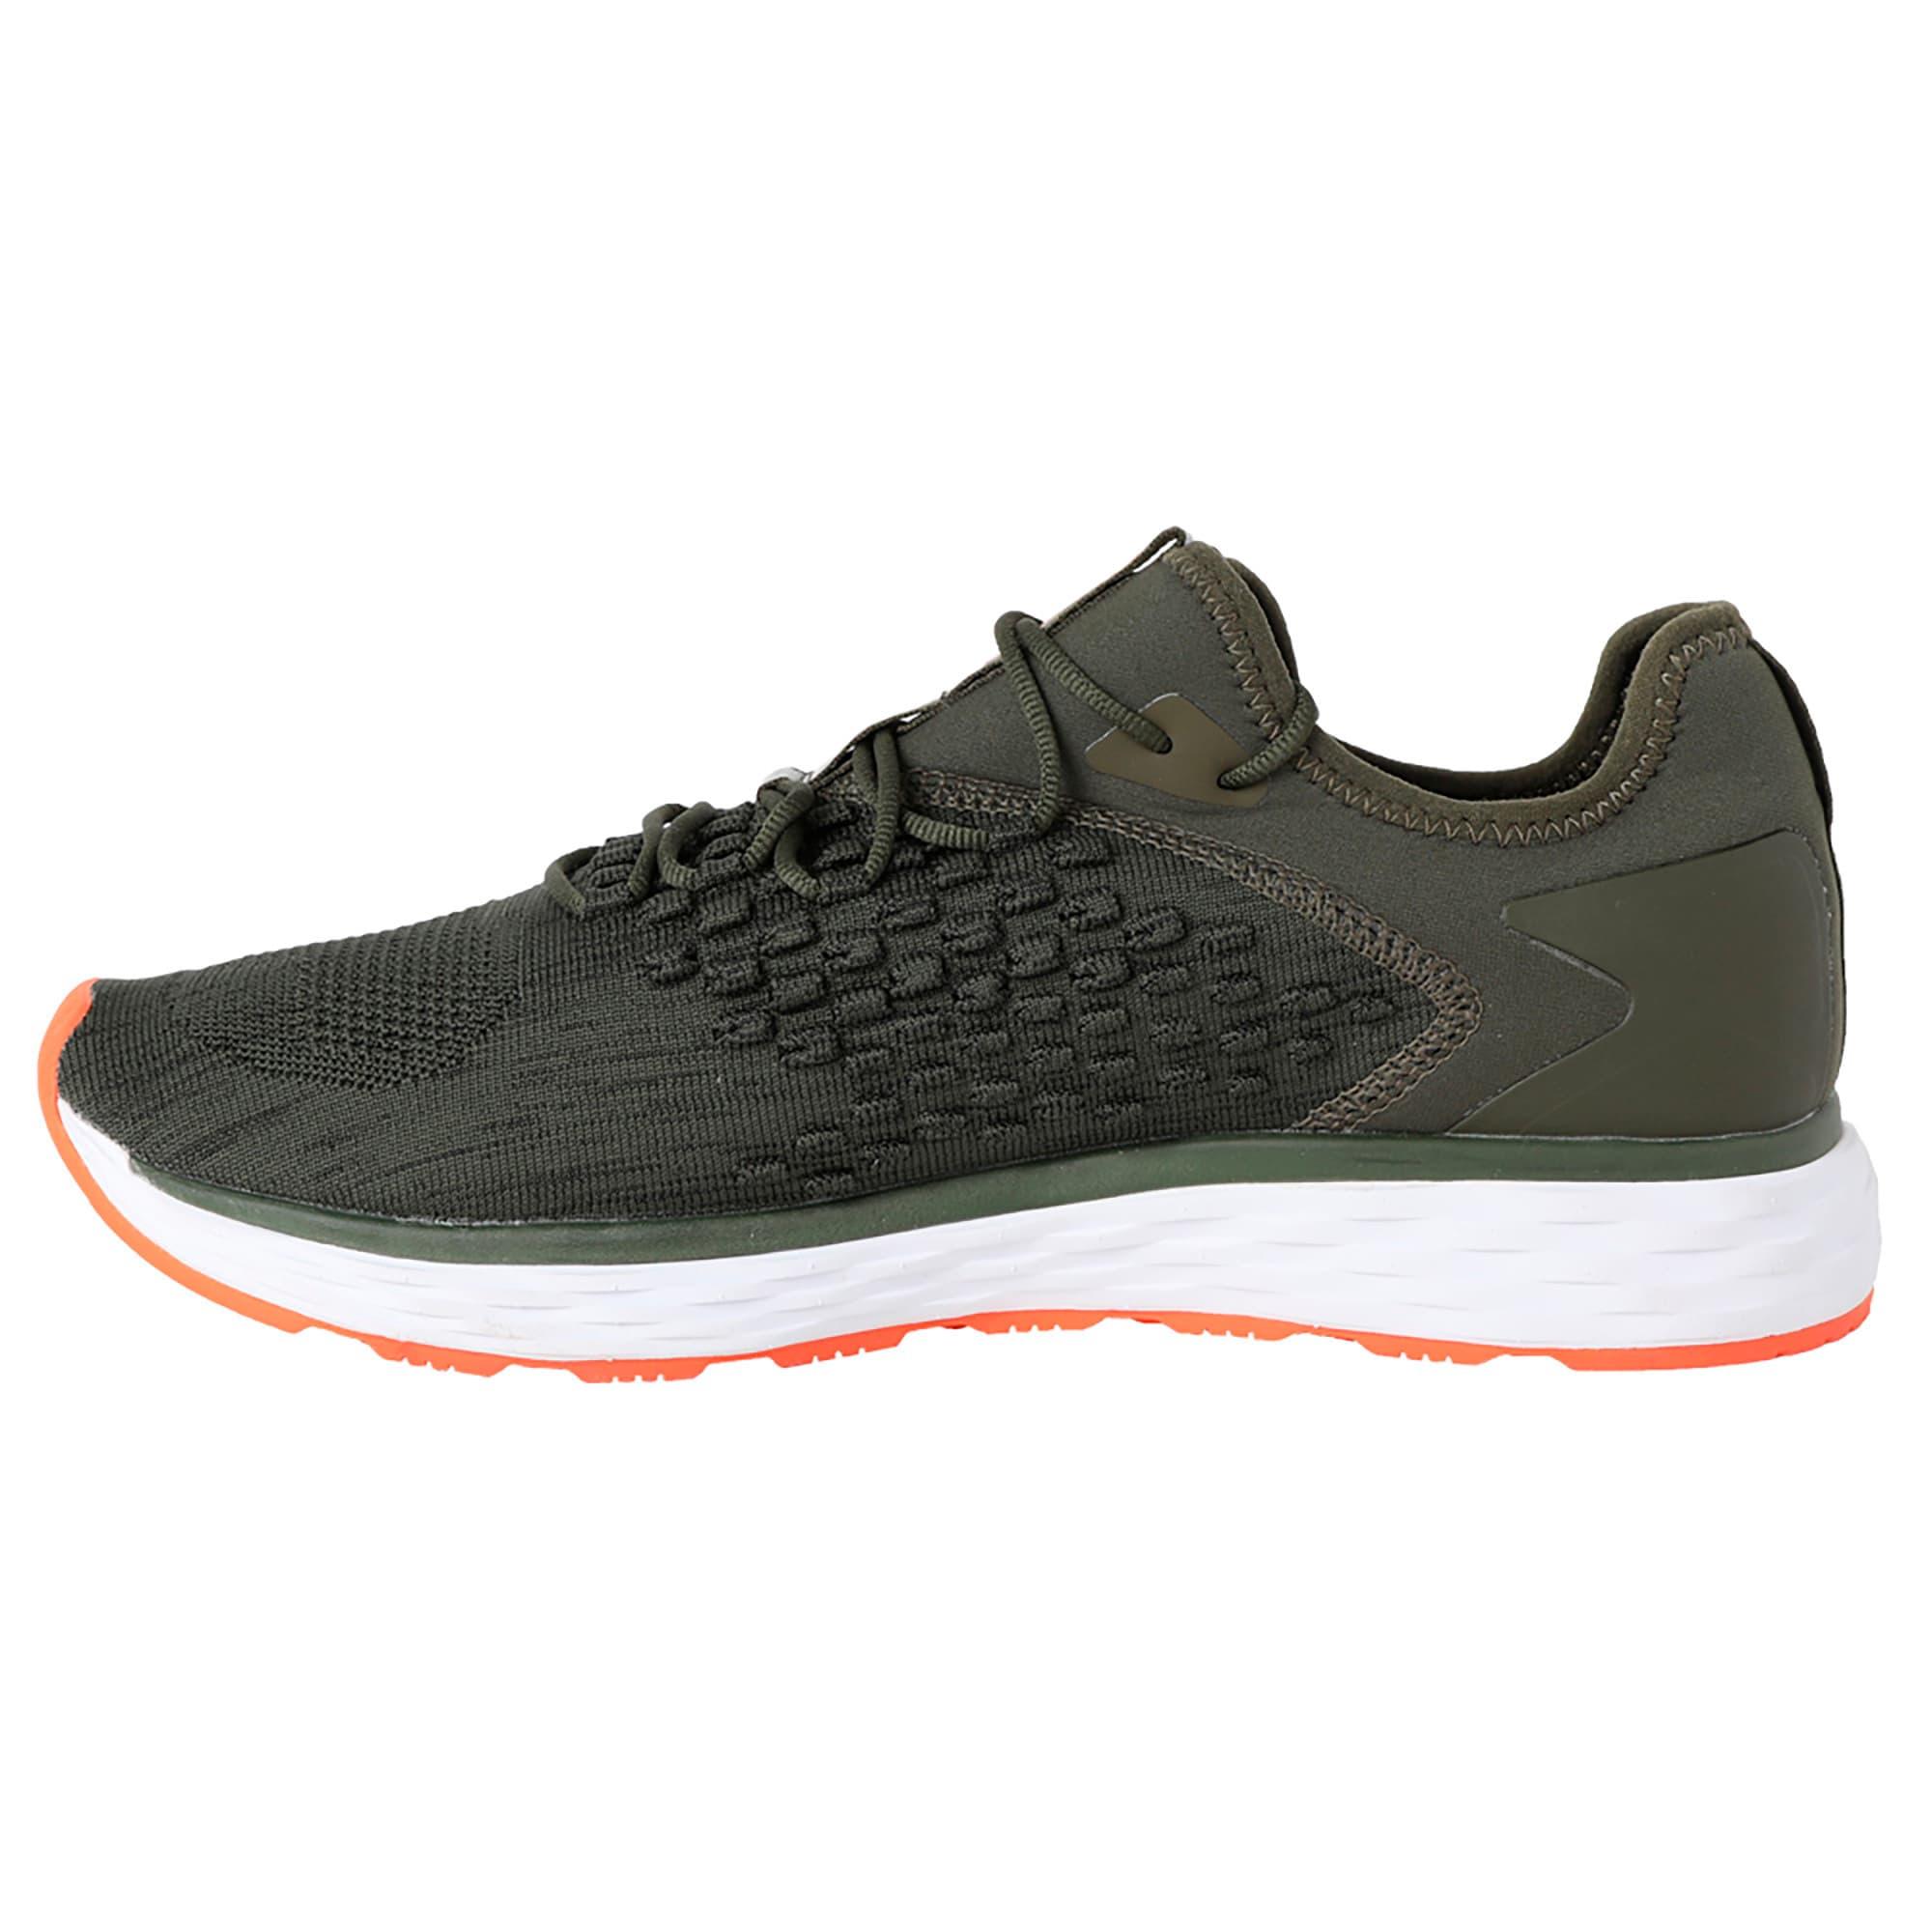 Thumbnail 1 of SPEED FUSEFIT Men's Running Shoes, Forest Night-Firecracker, medium-IND